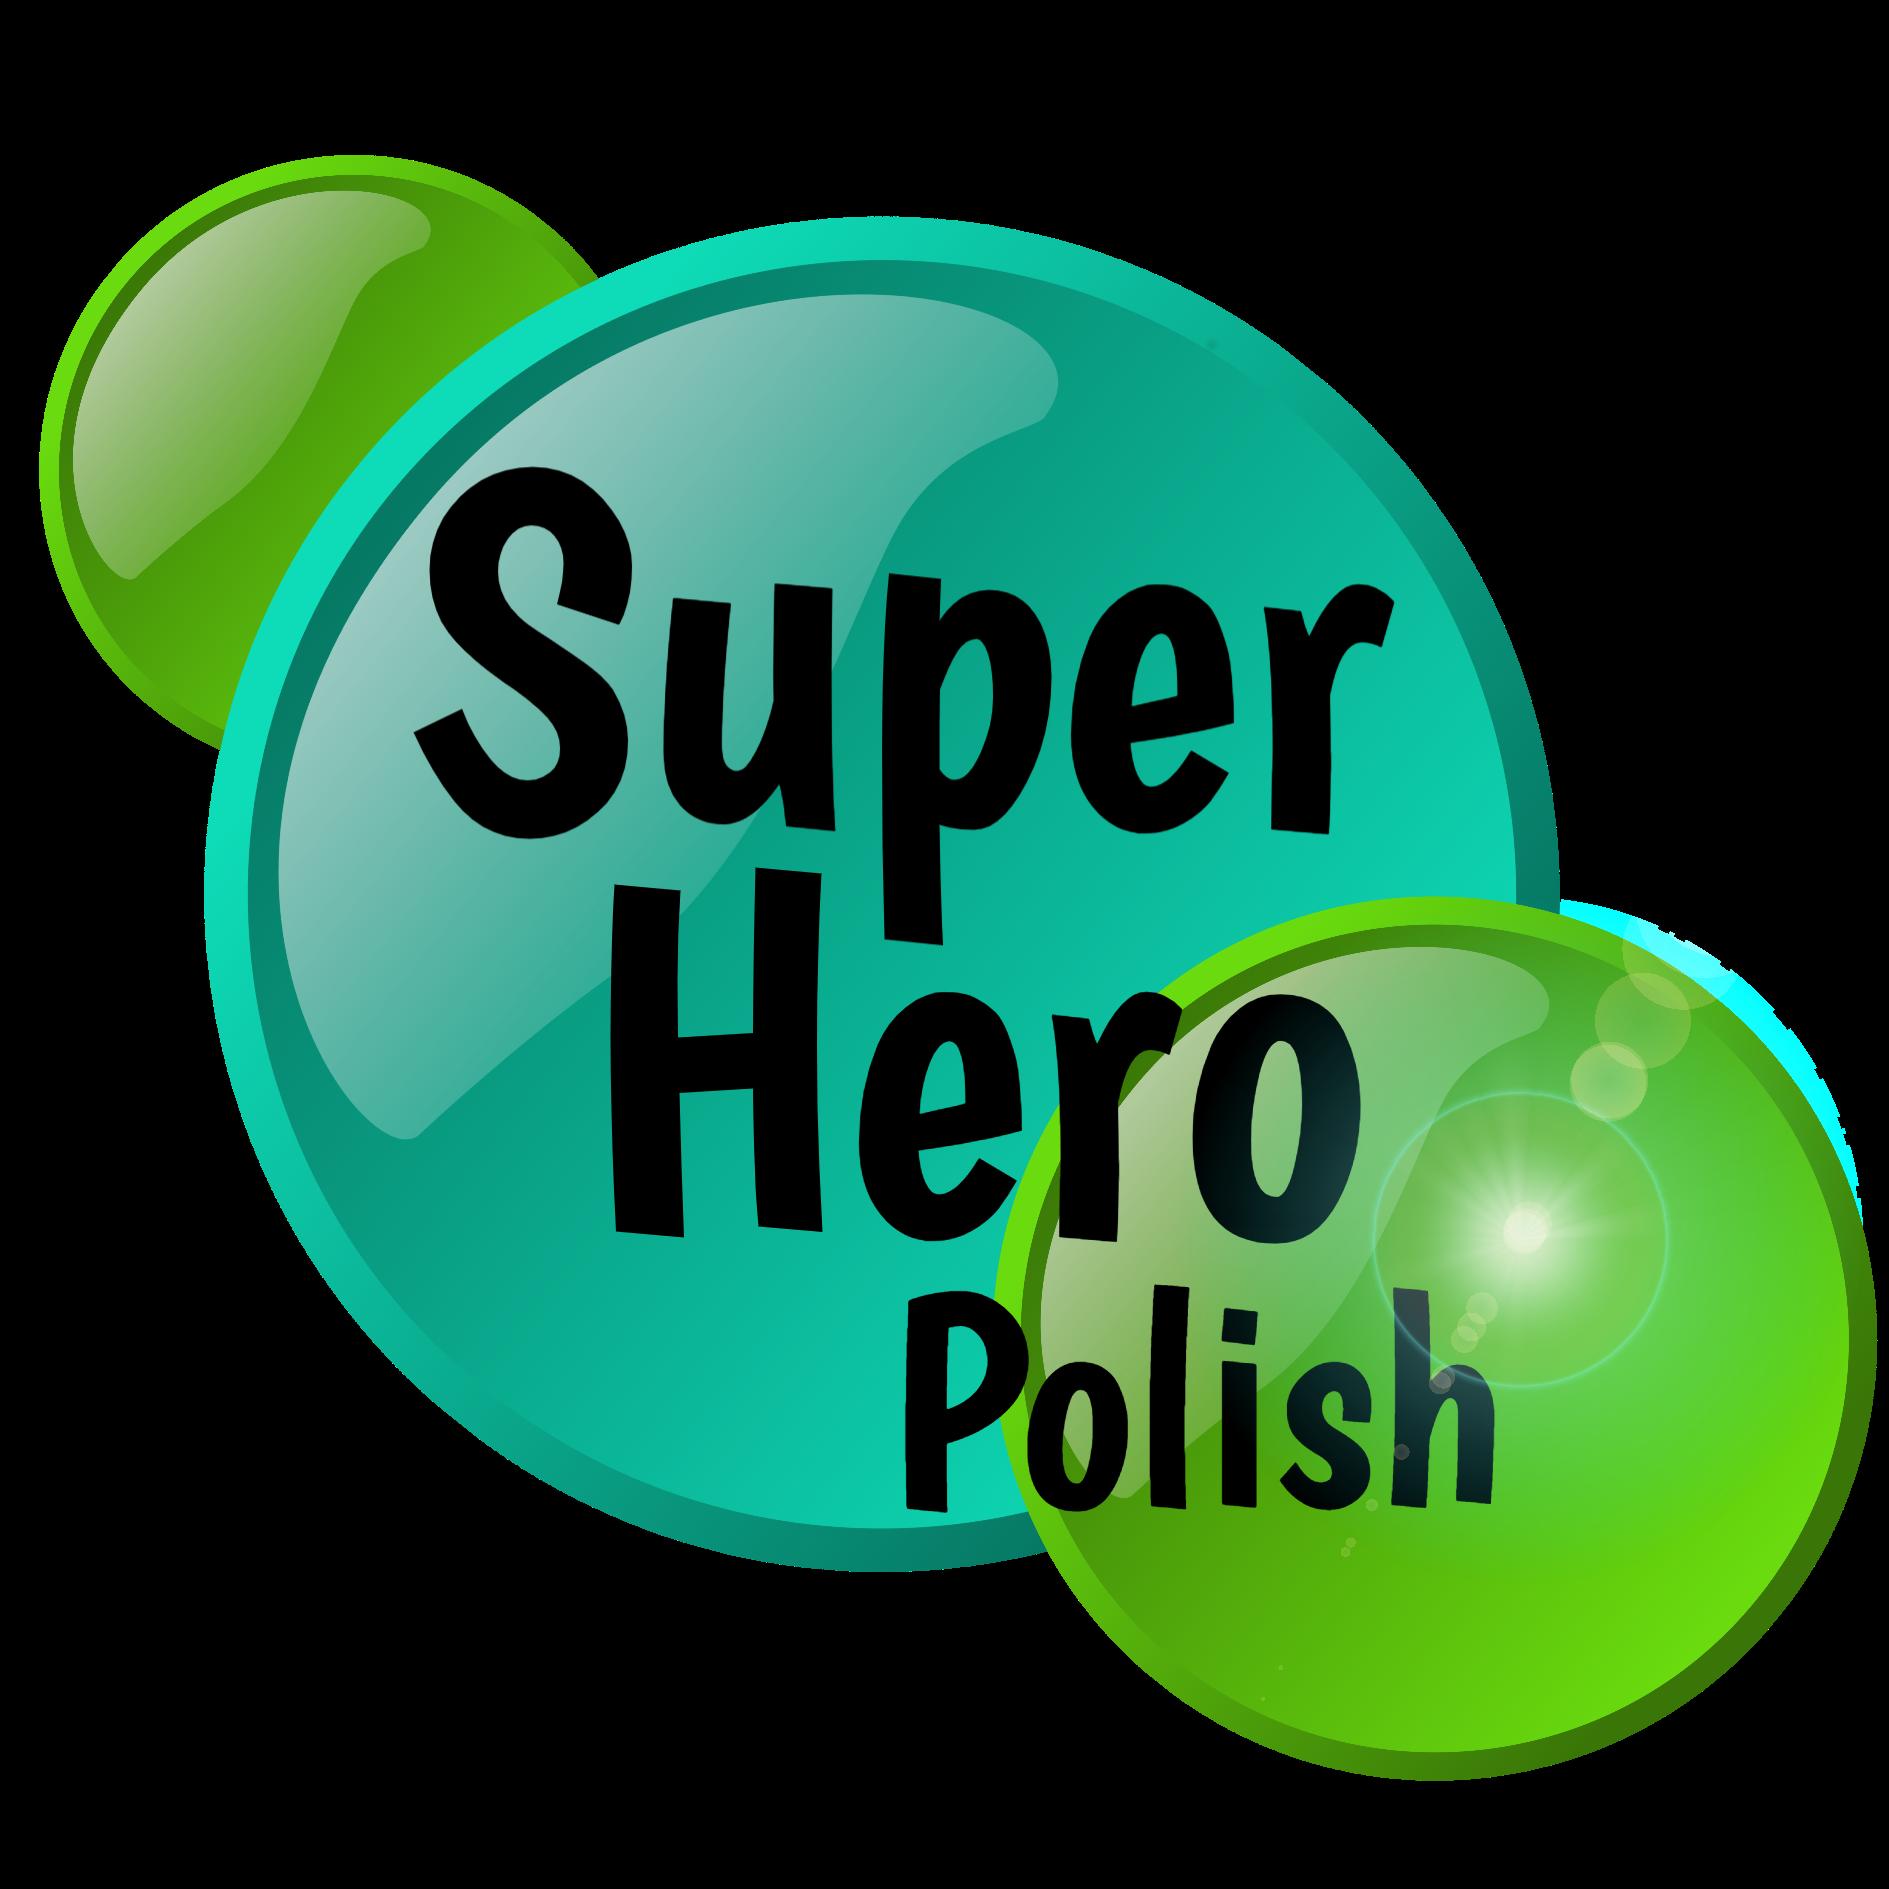 Superhero Polish